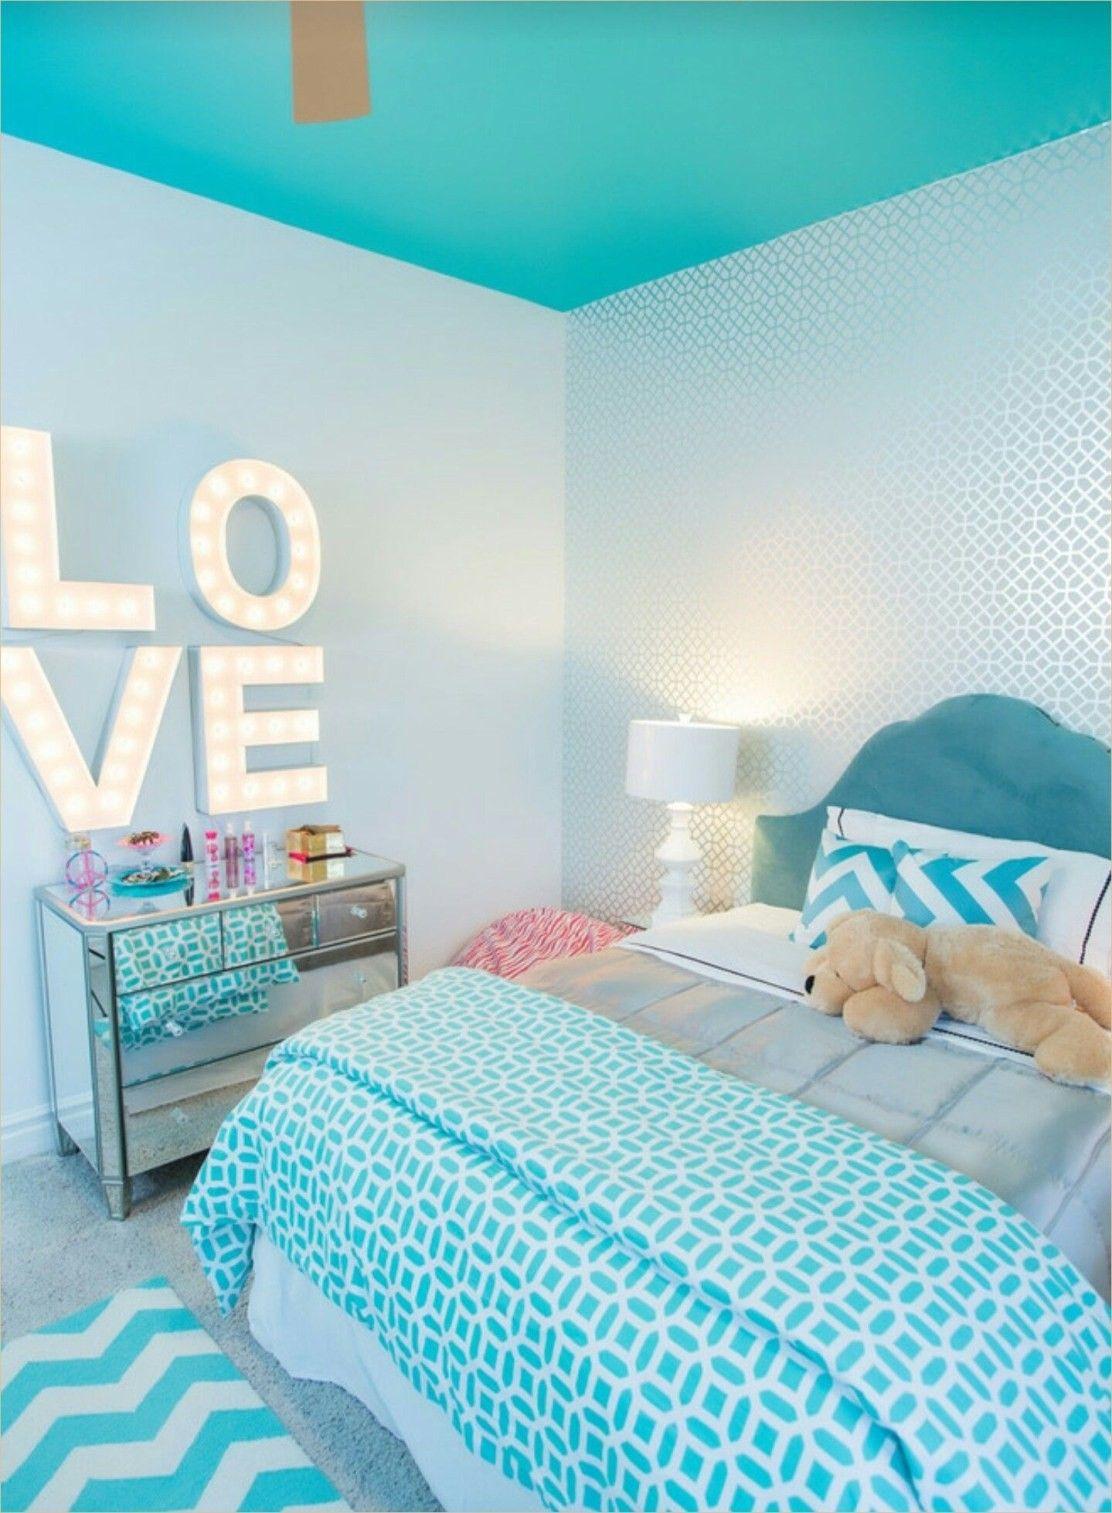 20+ Classy Turquoise Aesthetic Room Decor Ideas You Must ... on Classy Teenage Room Decor  id=41479